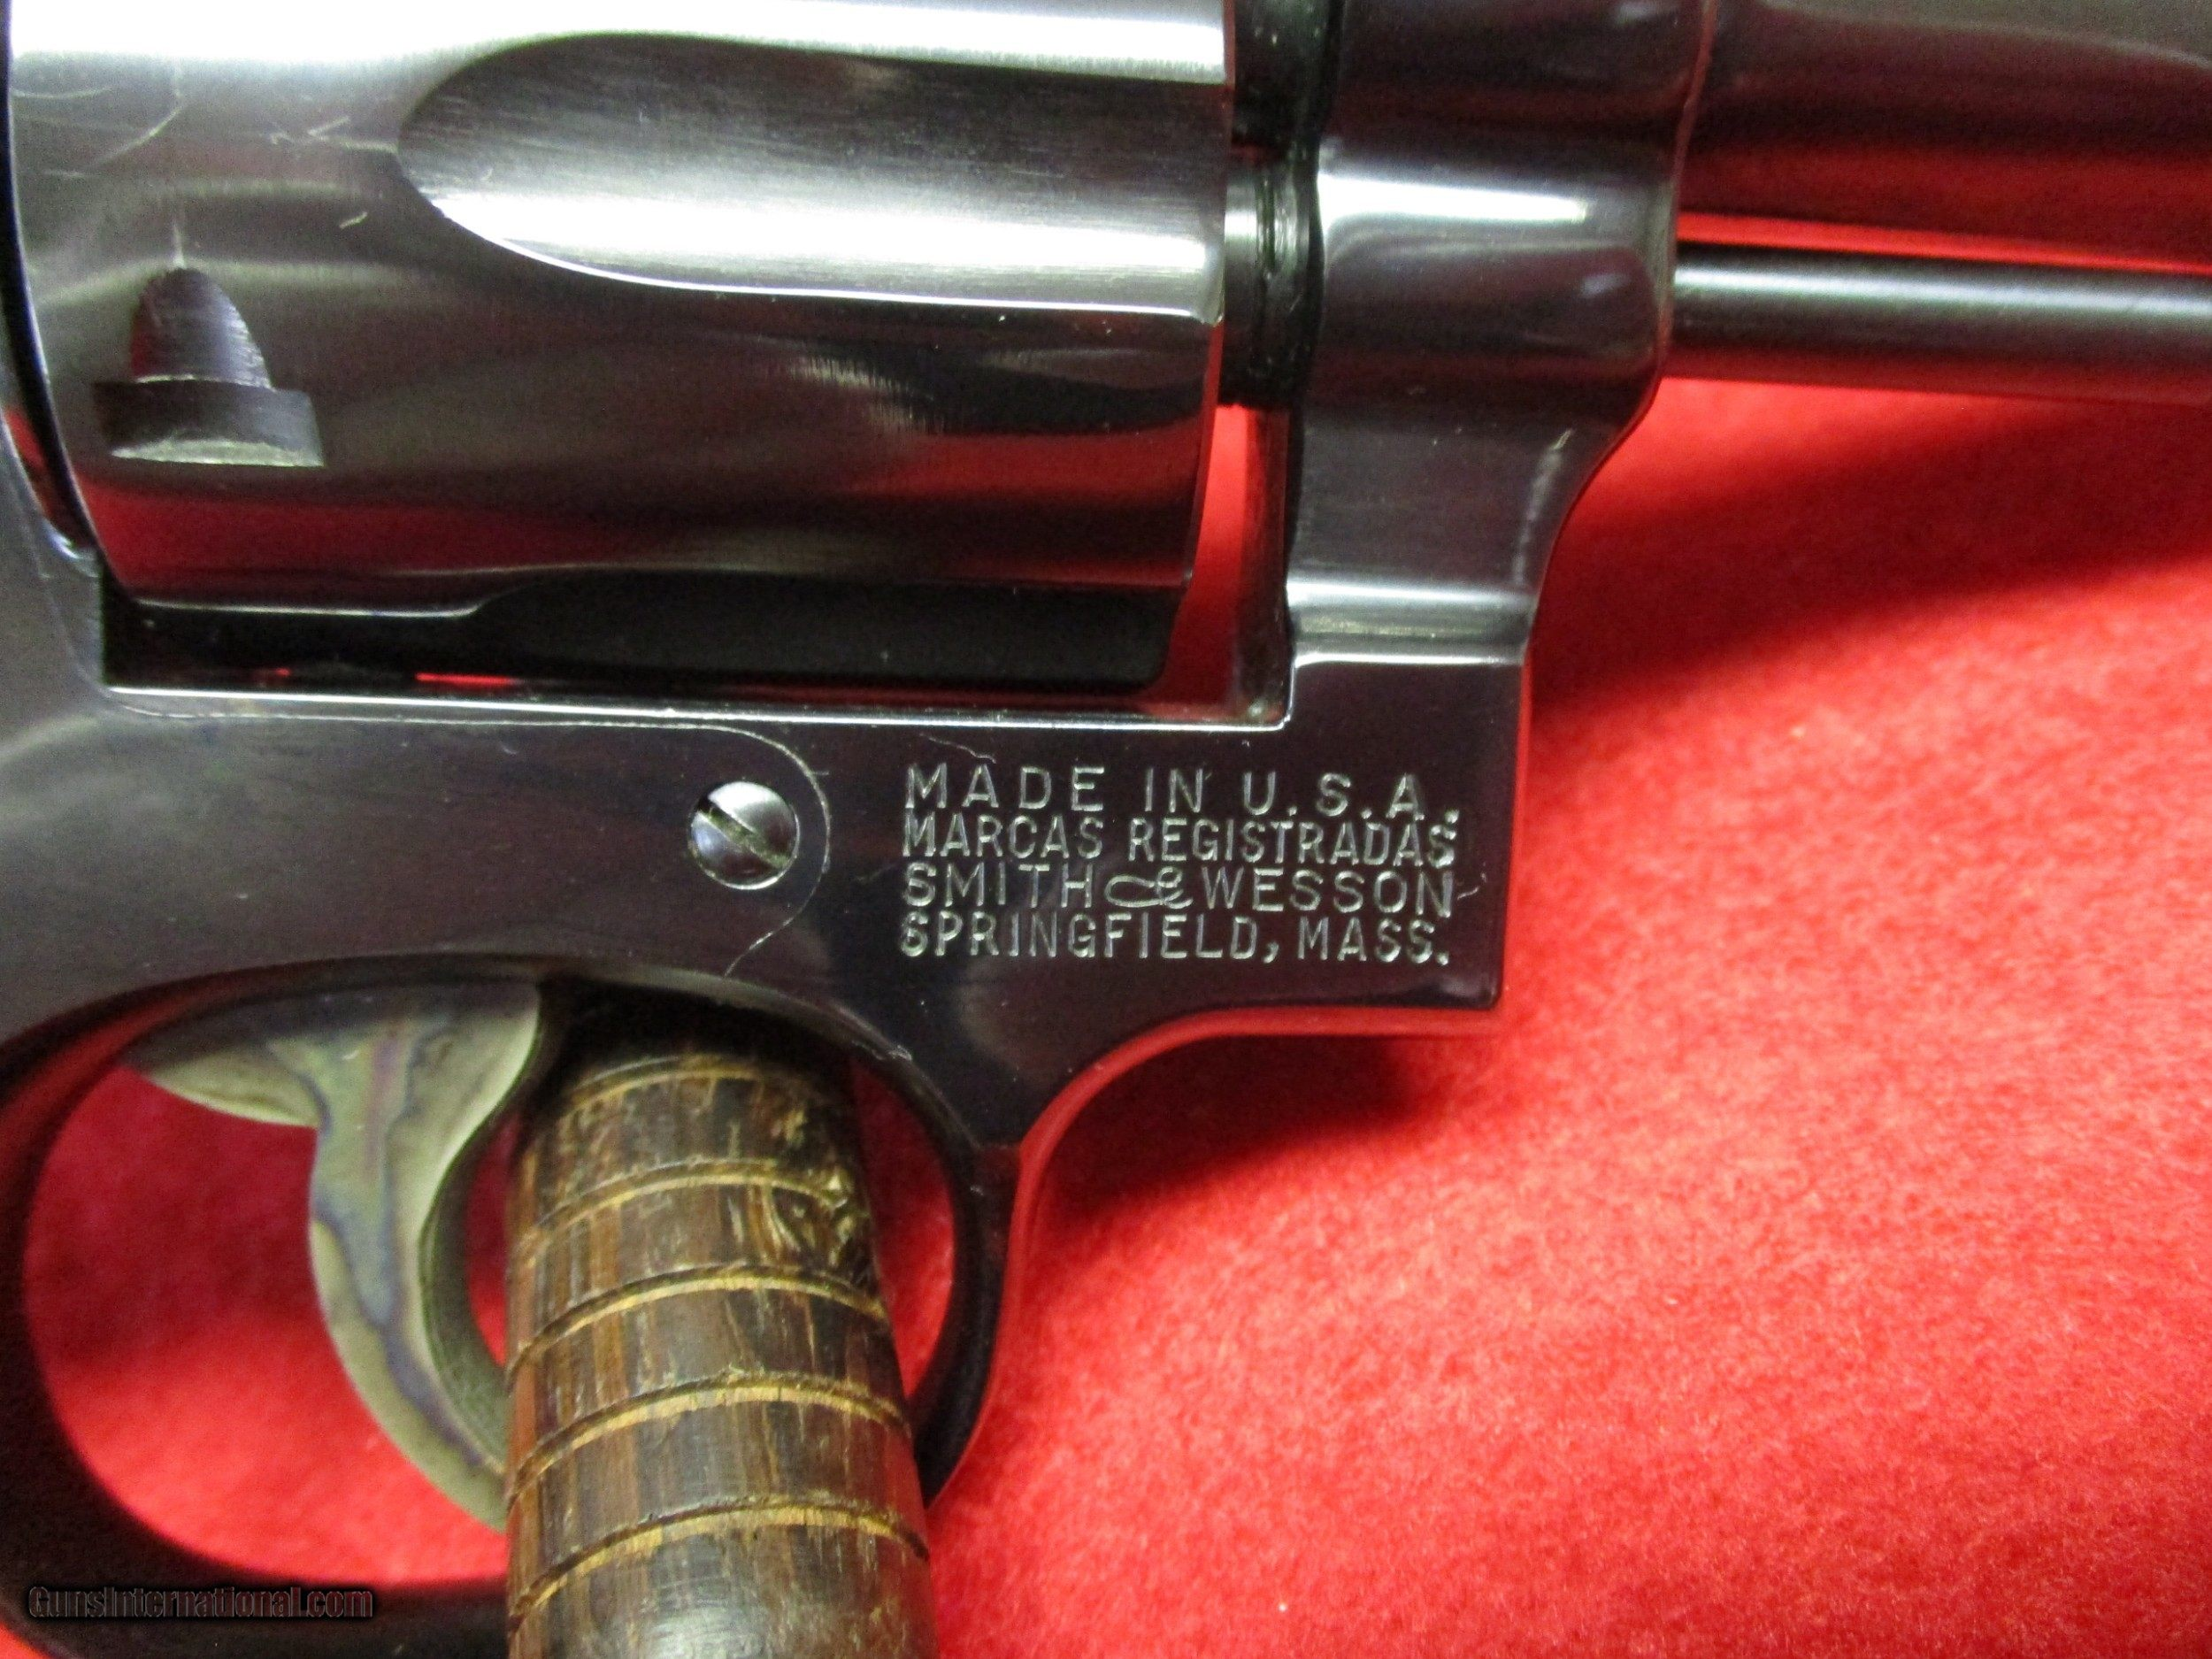 Smith en Wesson Model 10 serienummer dating